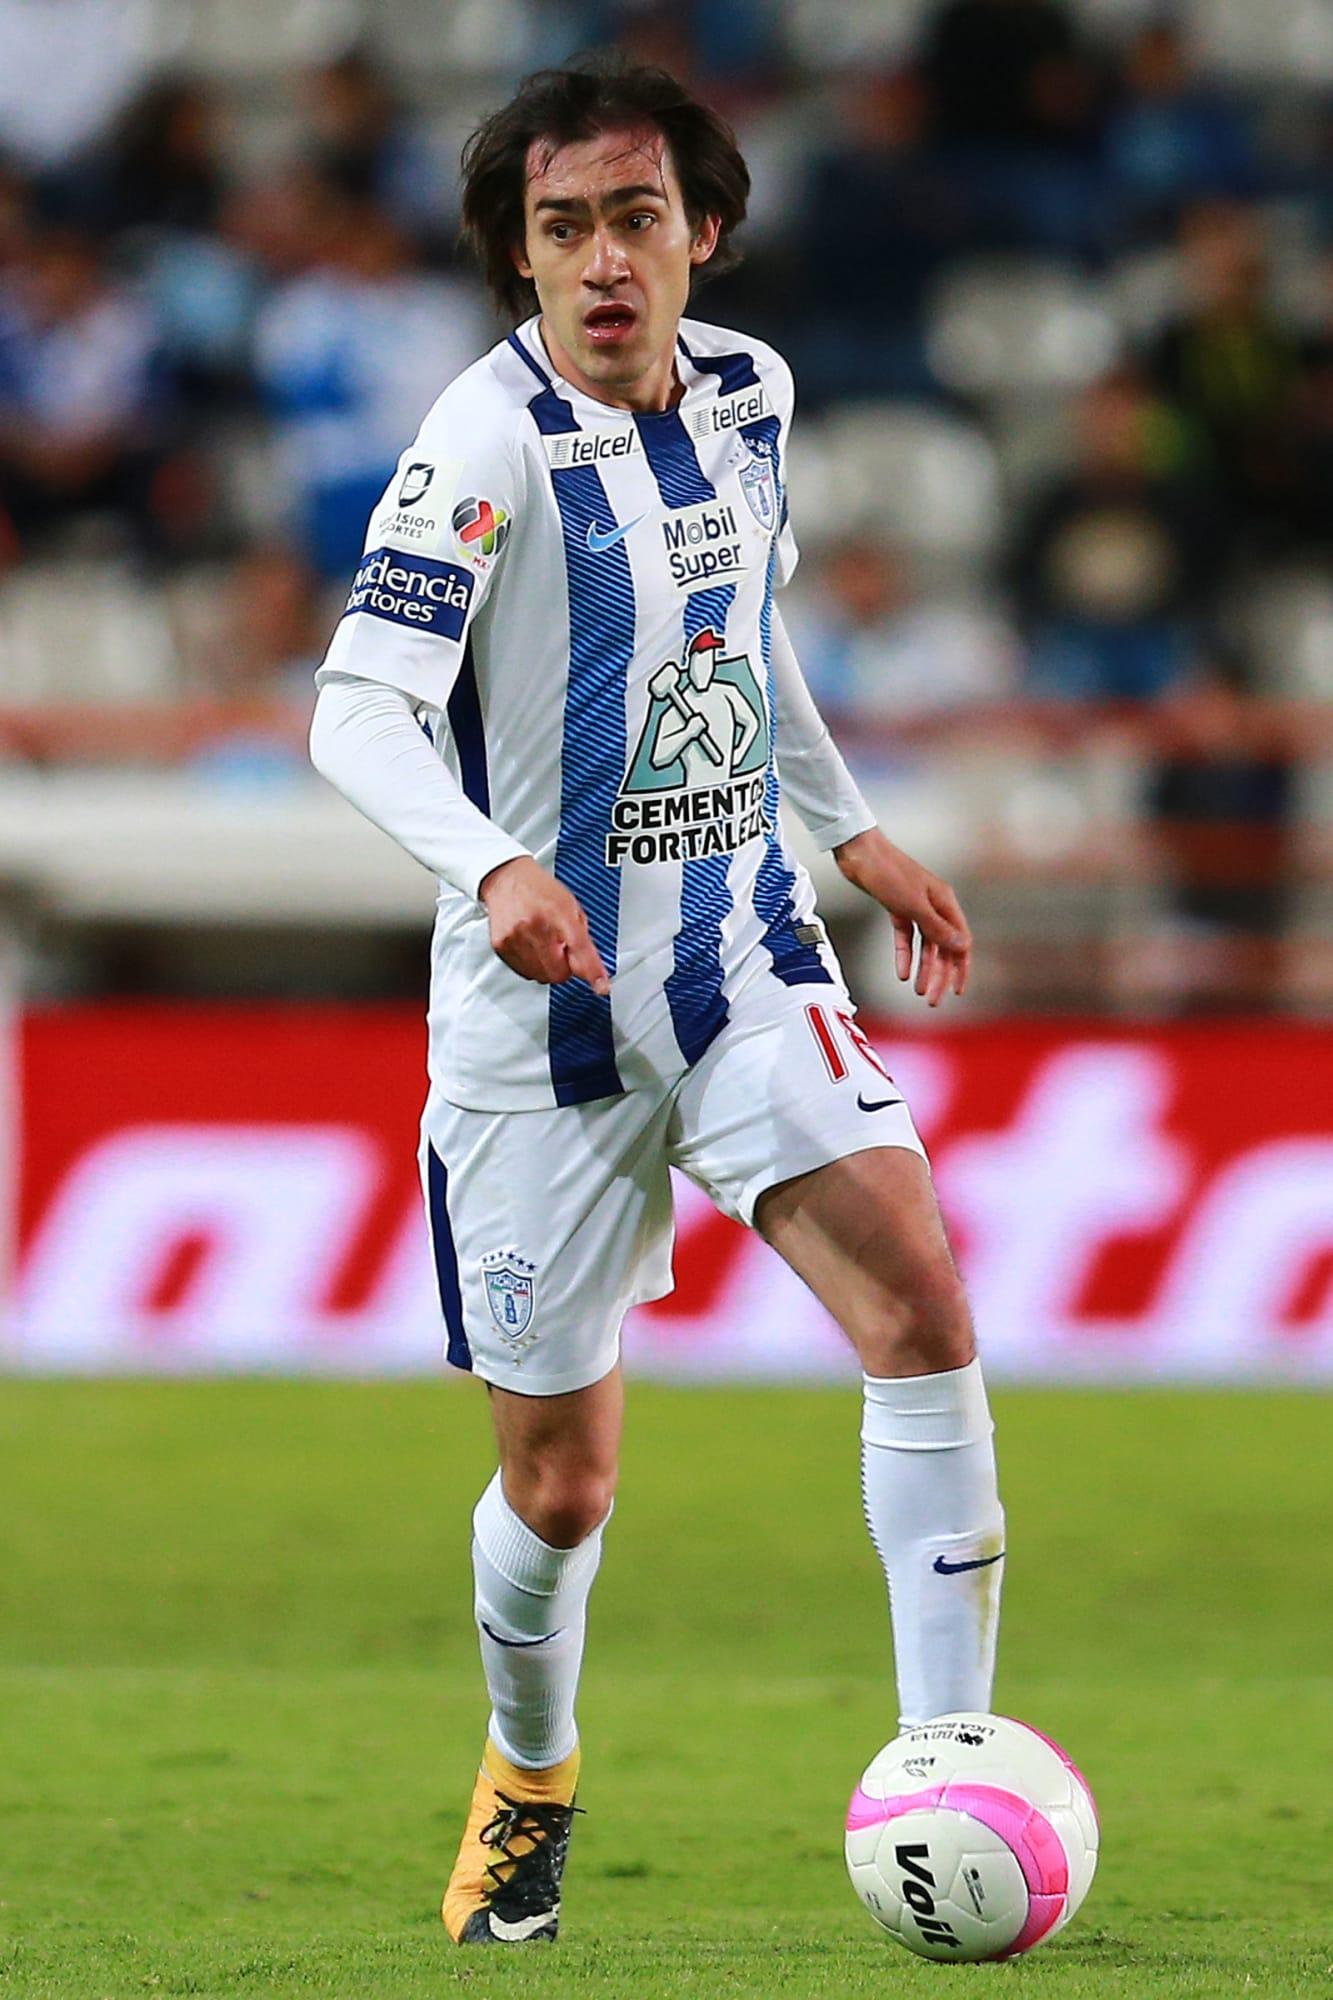 Cruz Azul sign Jose 'Shaggy' Martinez